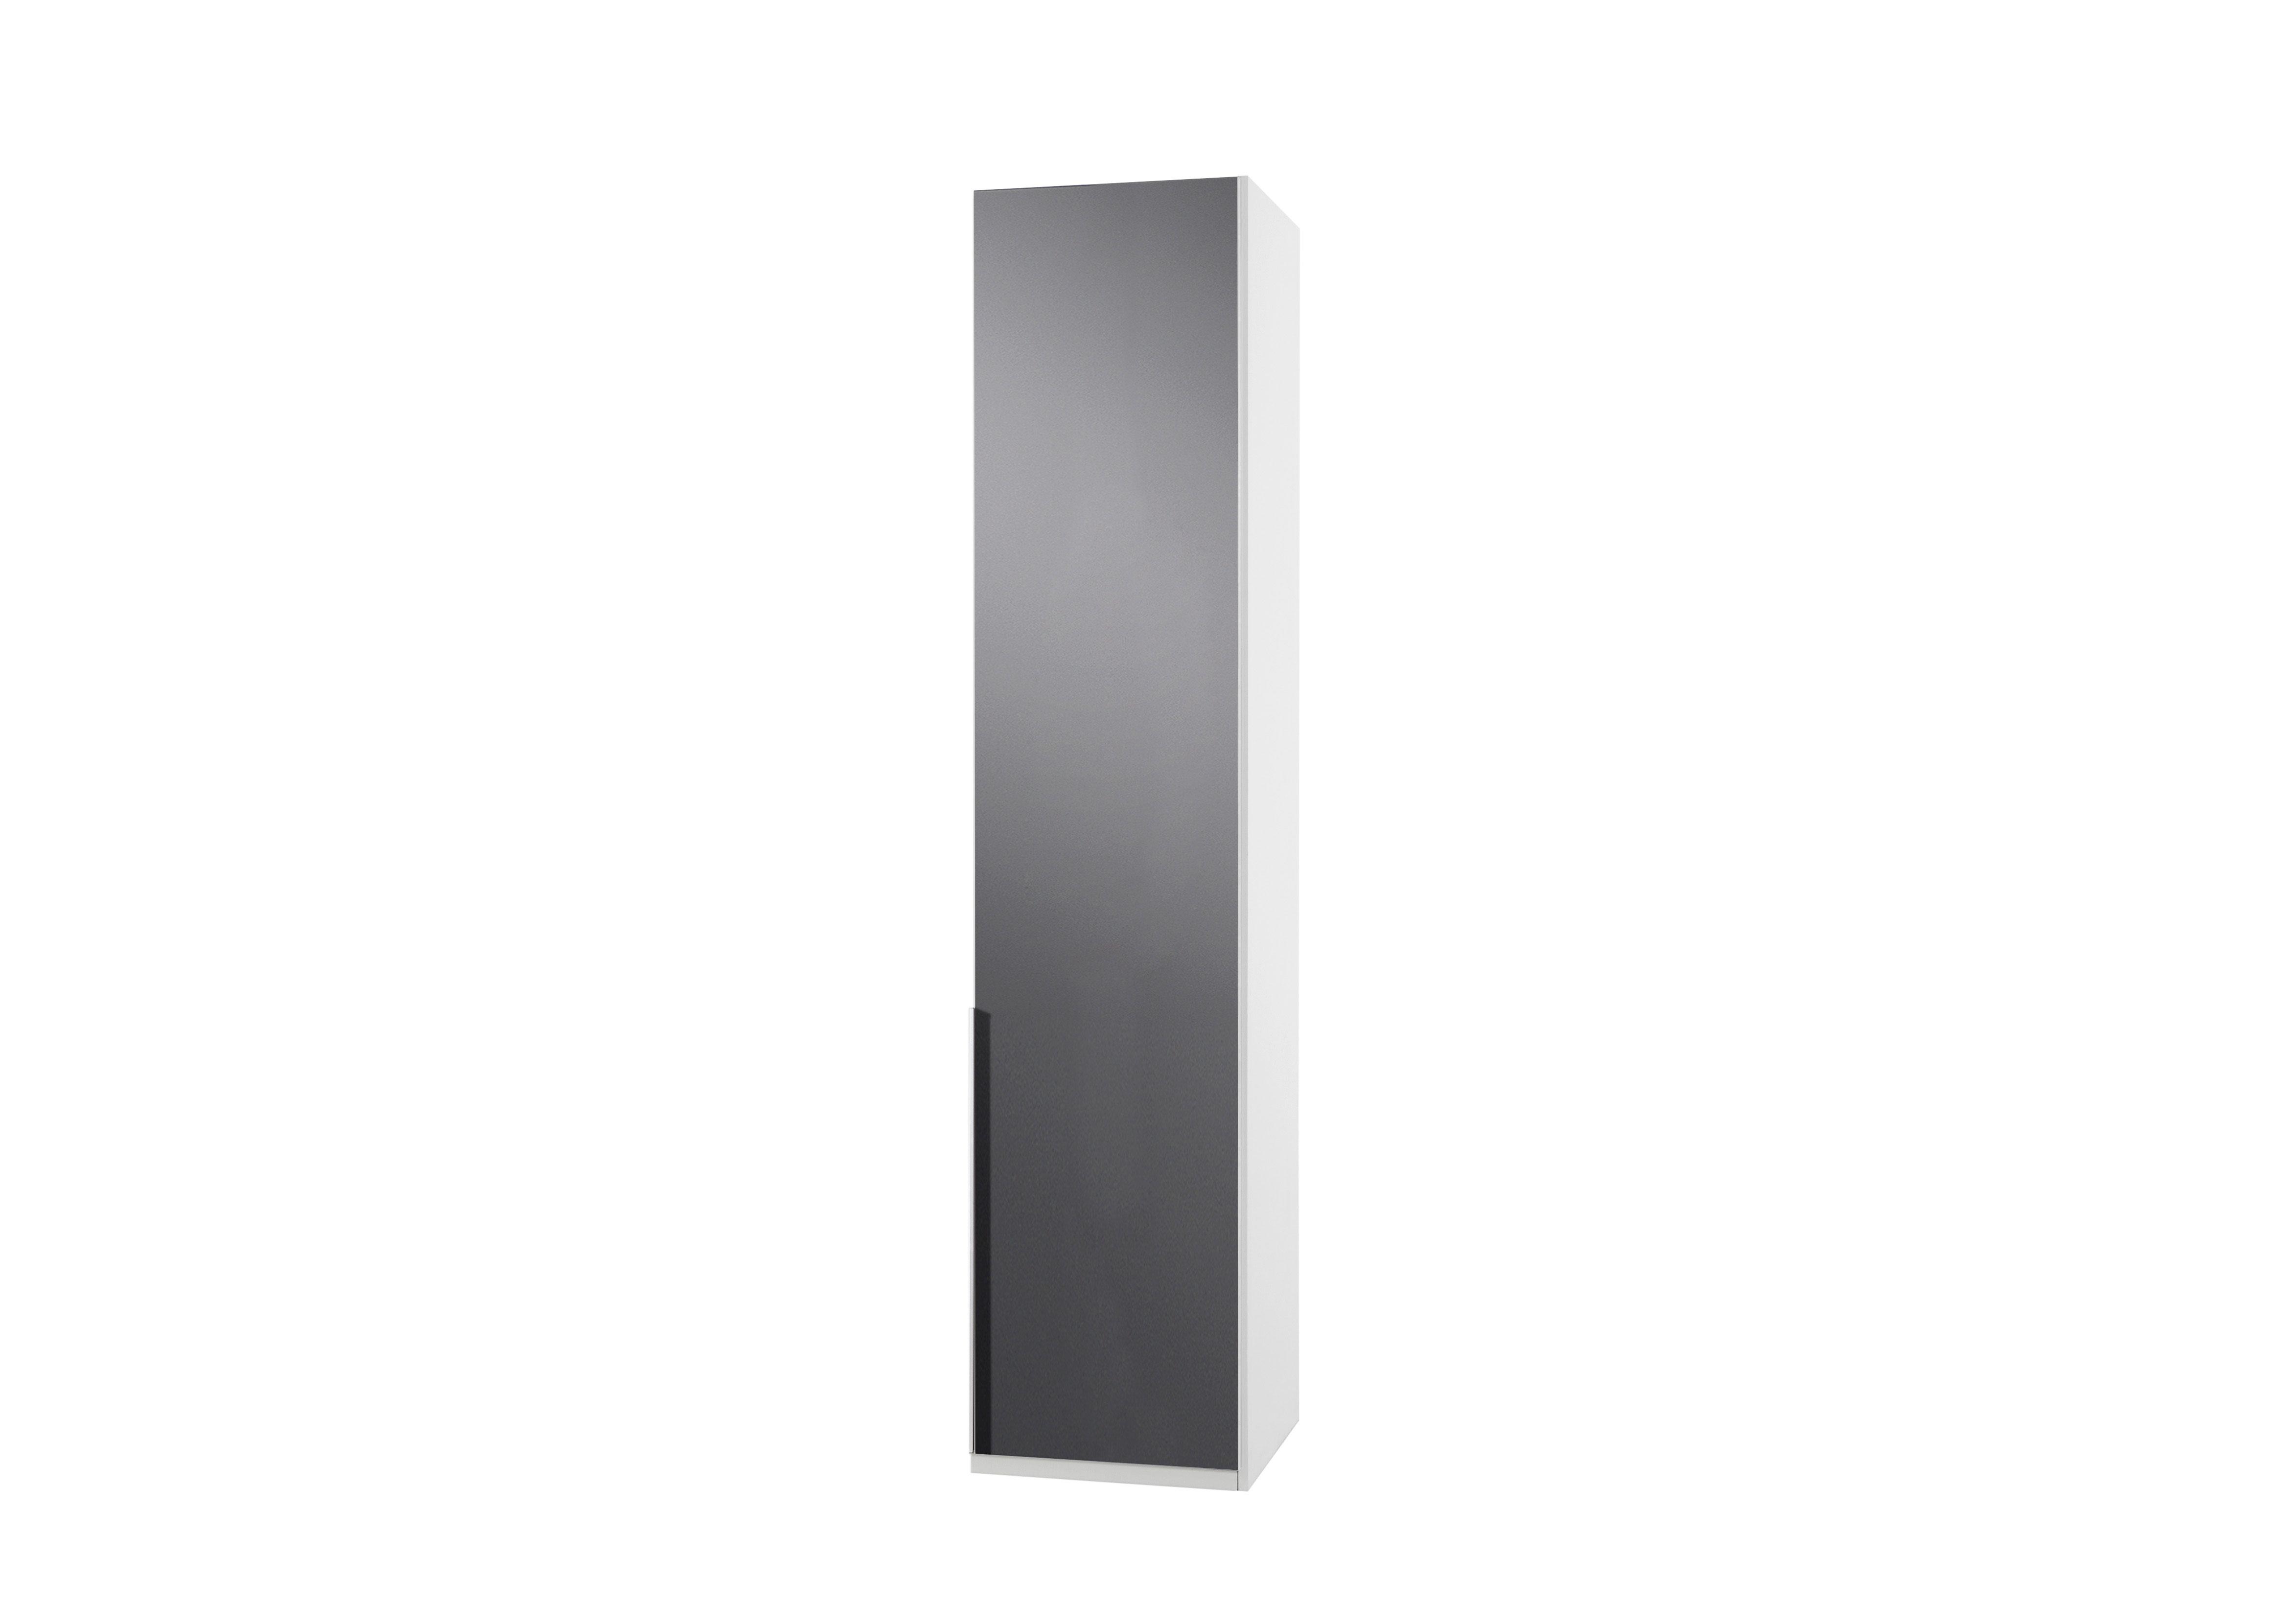 Amoire design 1 porte blanc alpin/verre gris Tony